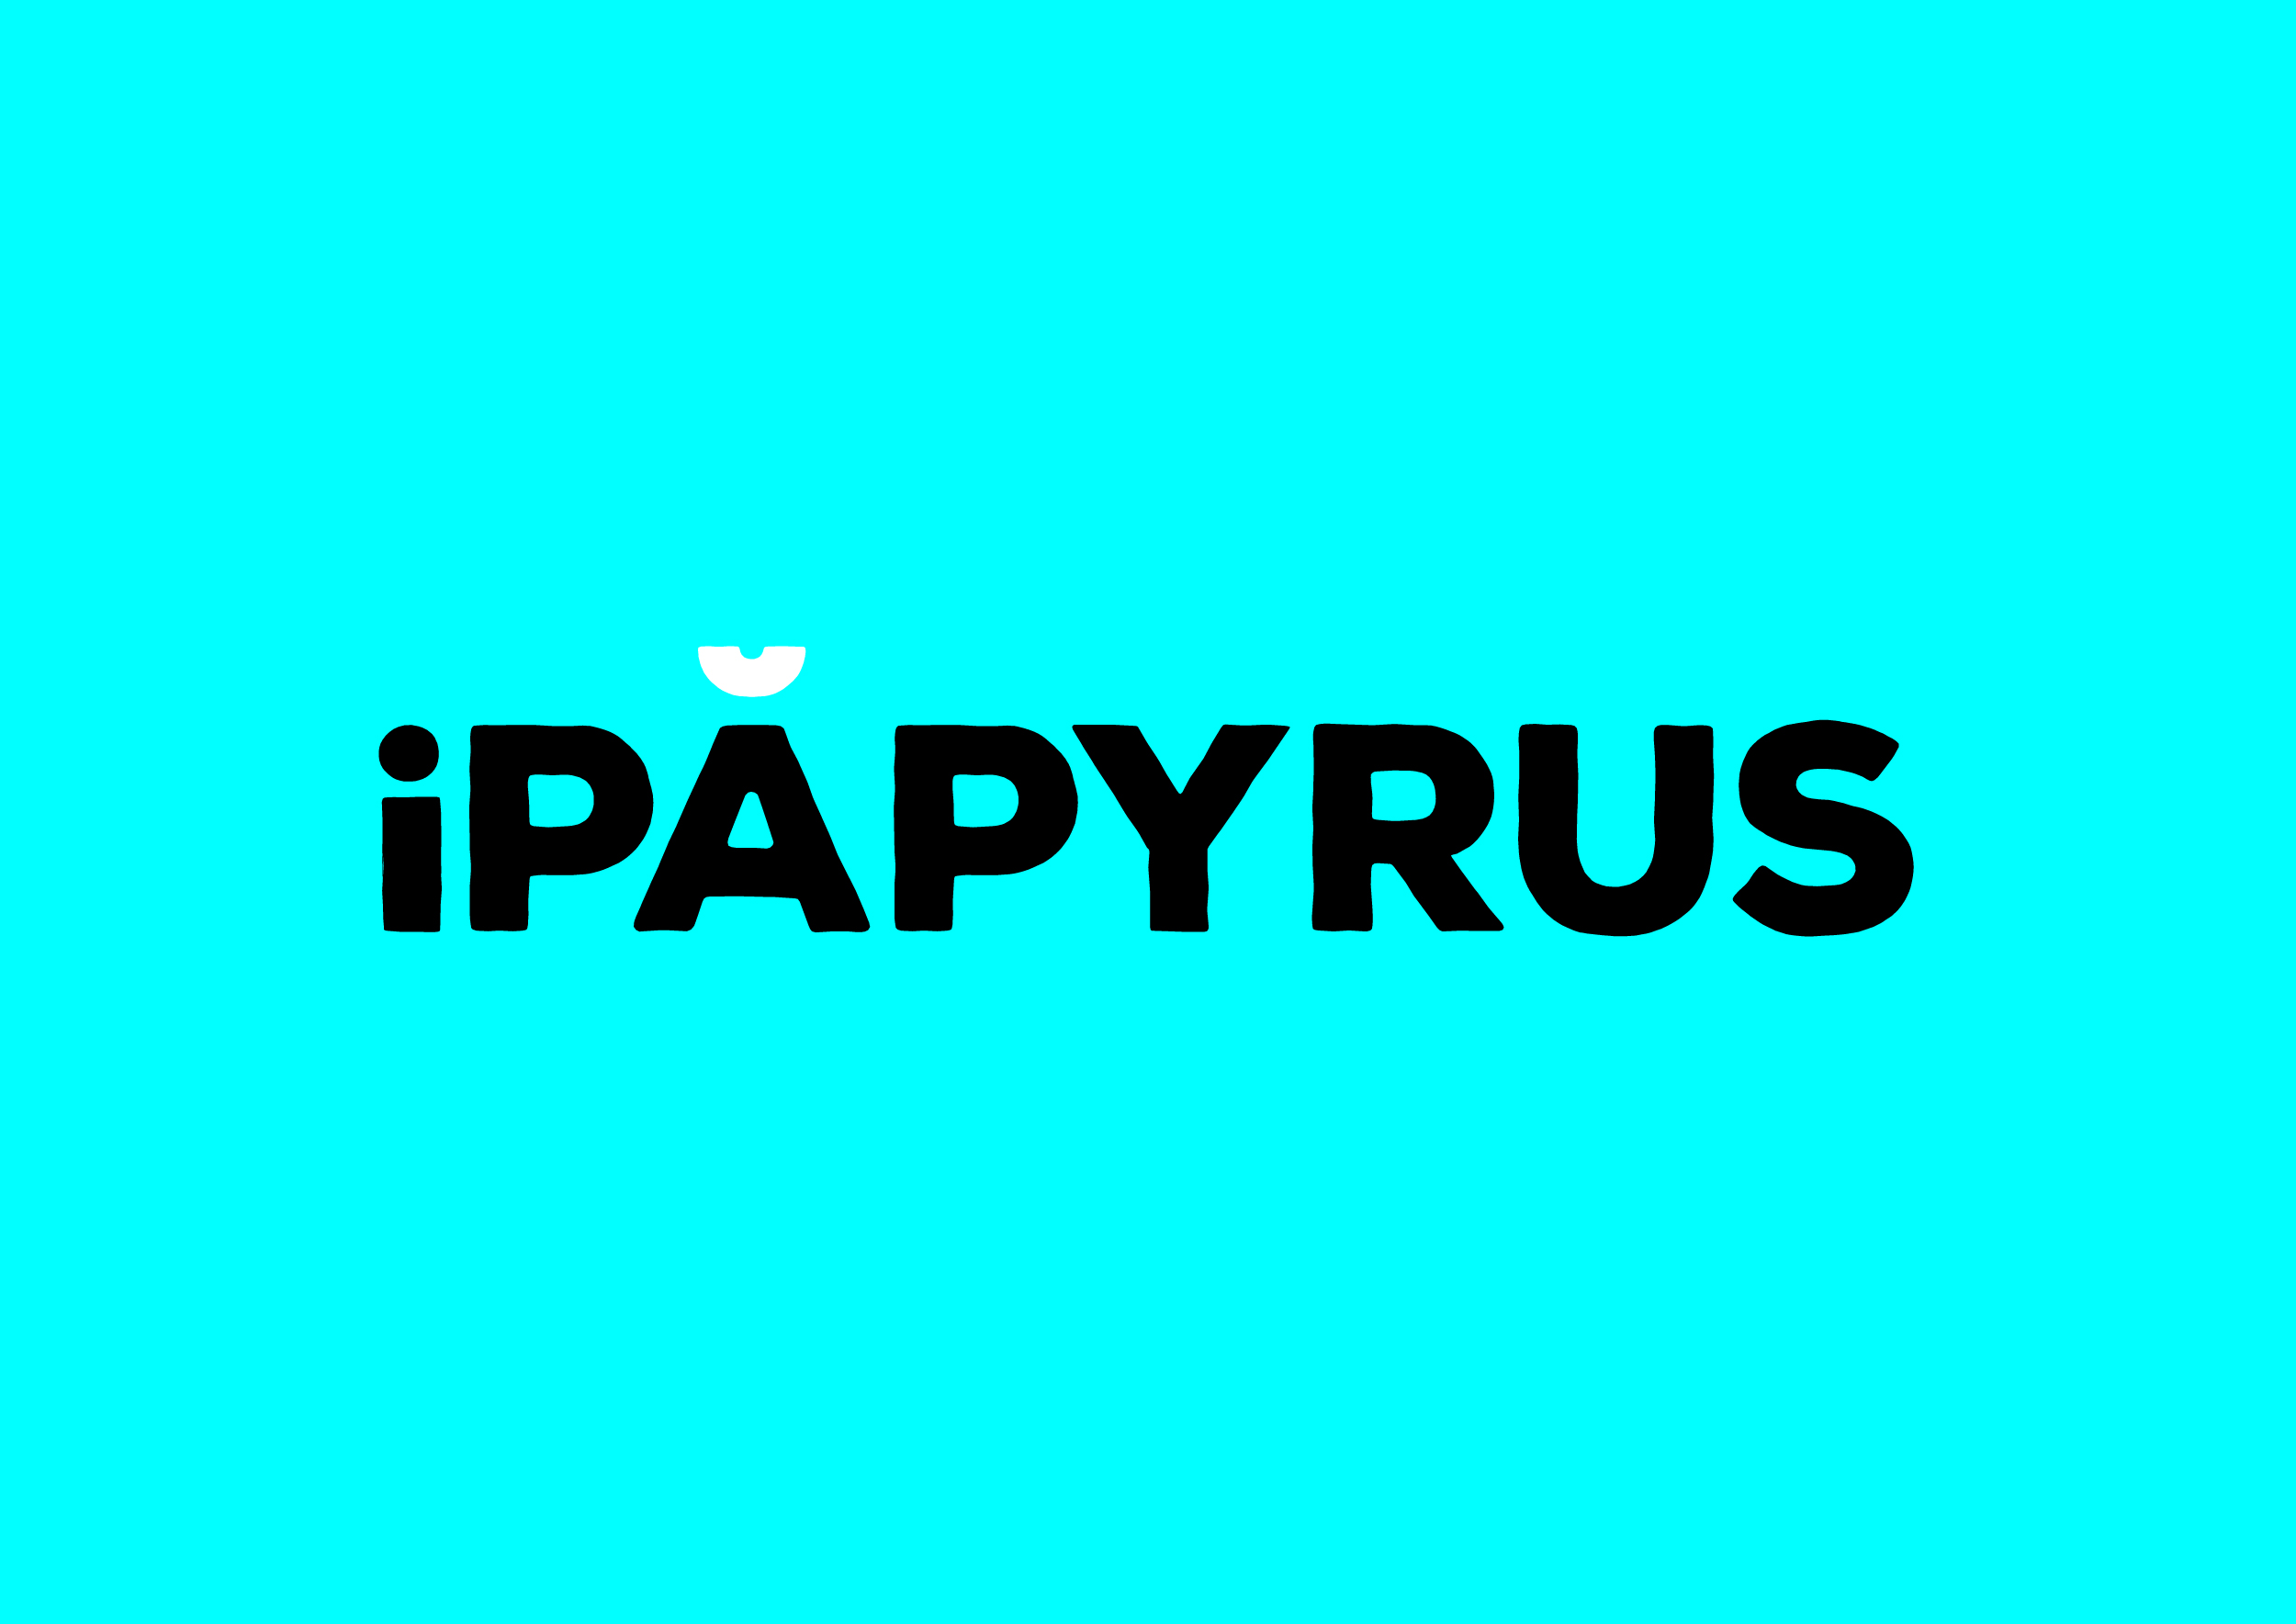 ipapyrus logo 2-100.jpg